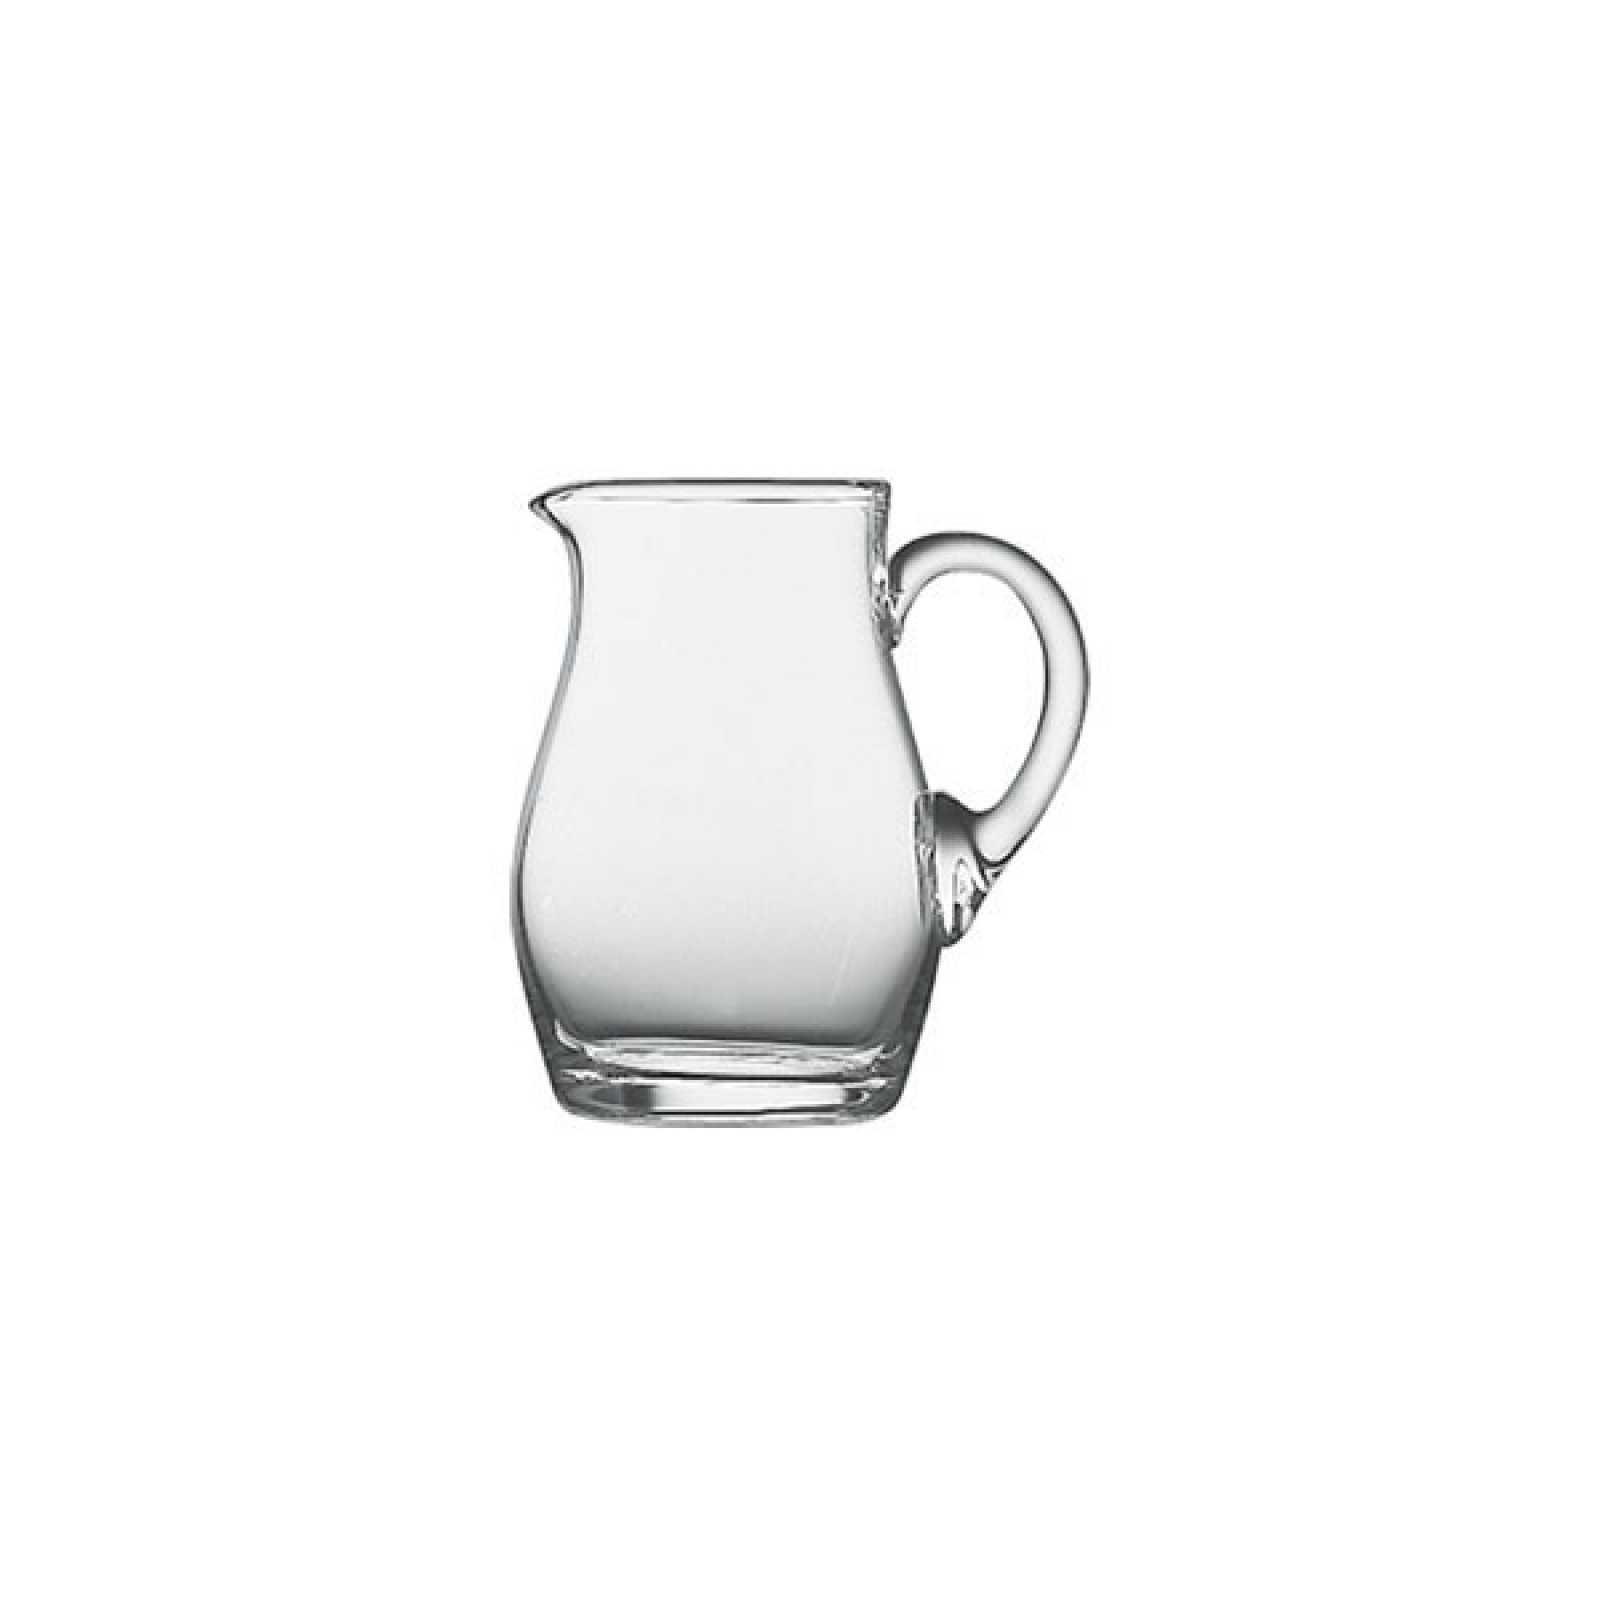 Онлайн каталог PROMENU: Кувшин хрустальный Schott Zwiesel BISTRO, объем 0,125 л, прозрачный Schott Zwiesel 400044